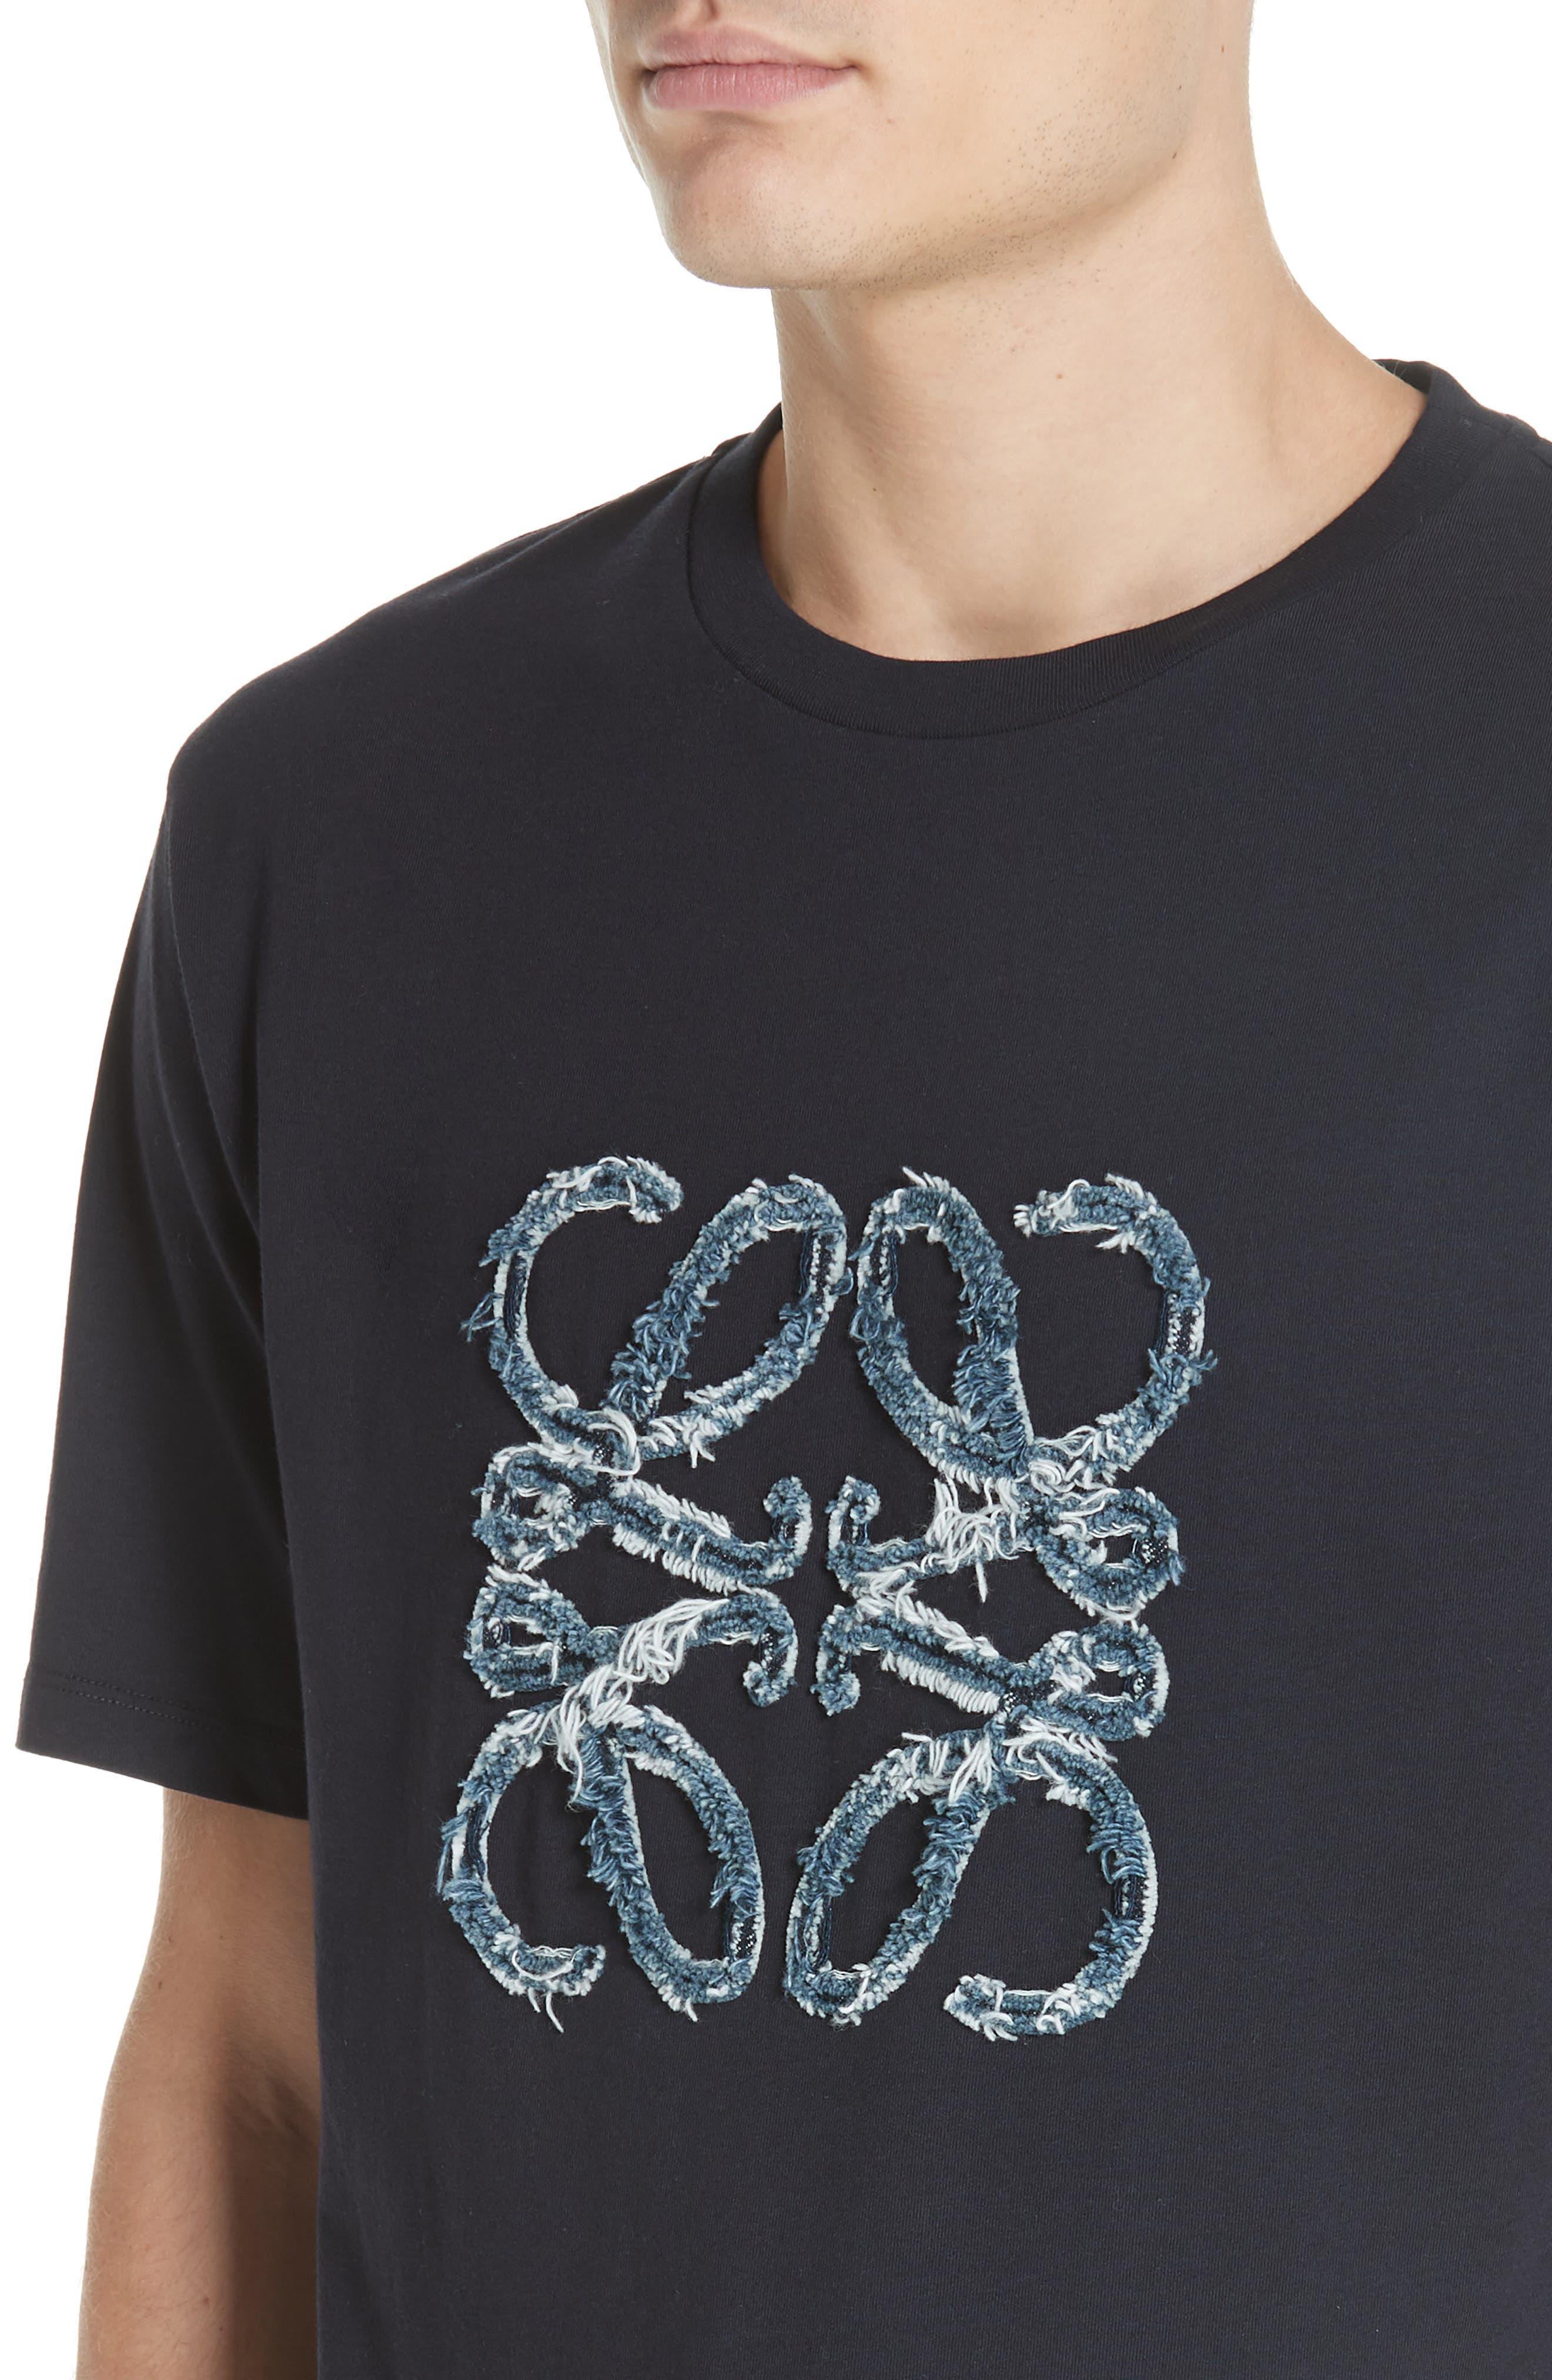 Anagram T-Shirt,                             Alternate thumbnail 4, color,                             410